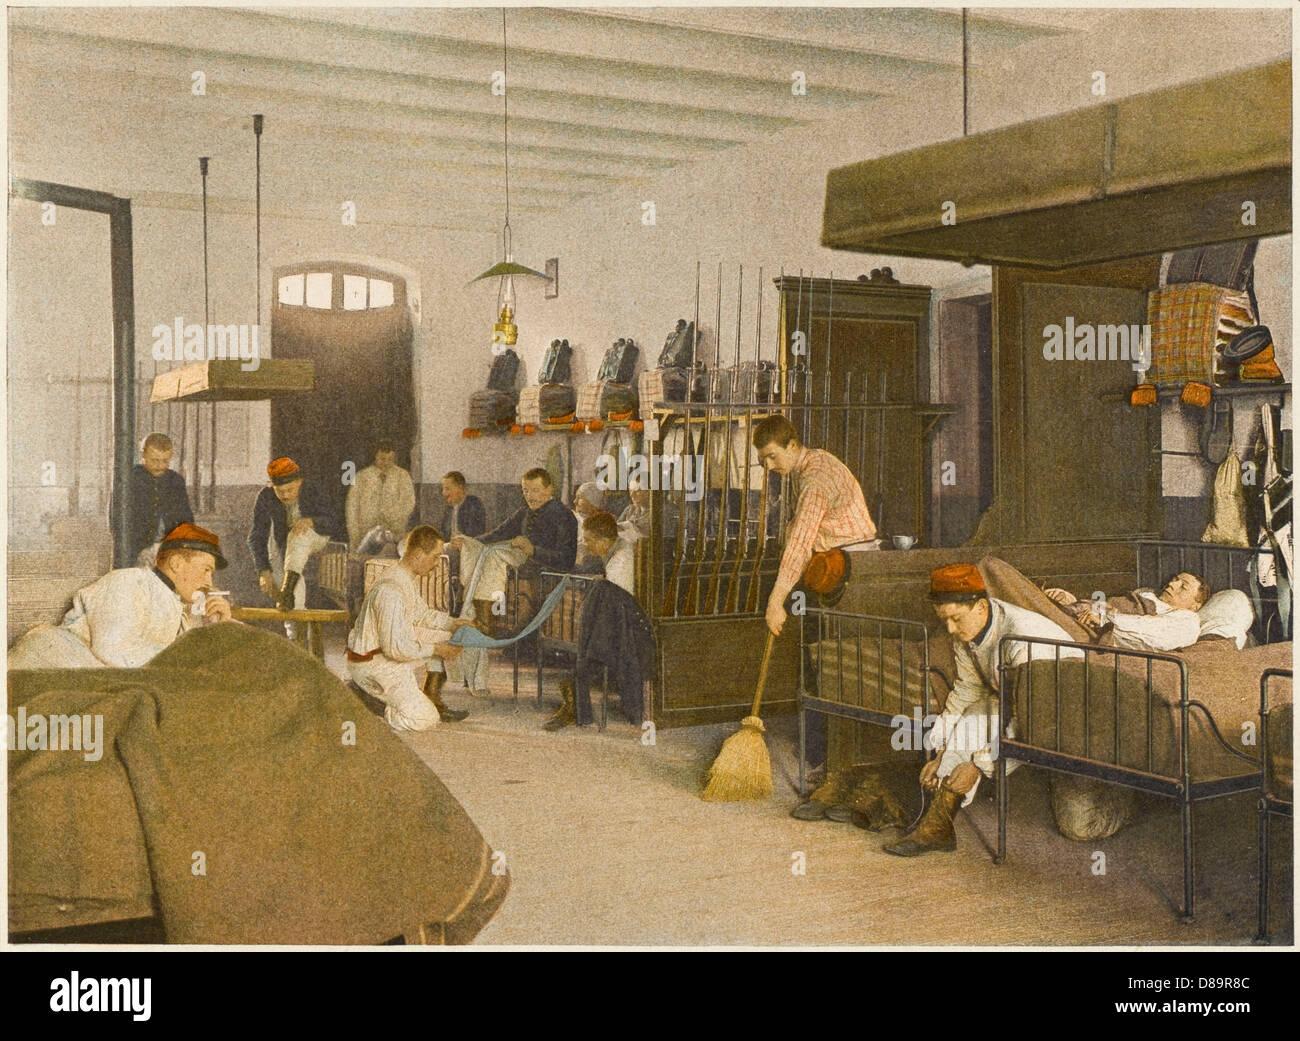 Waking In Barracks - Stock Image